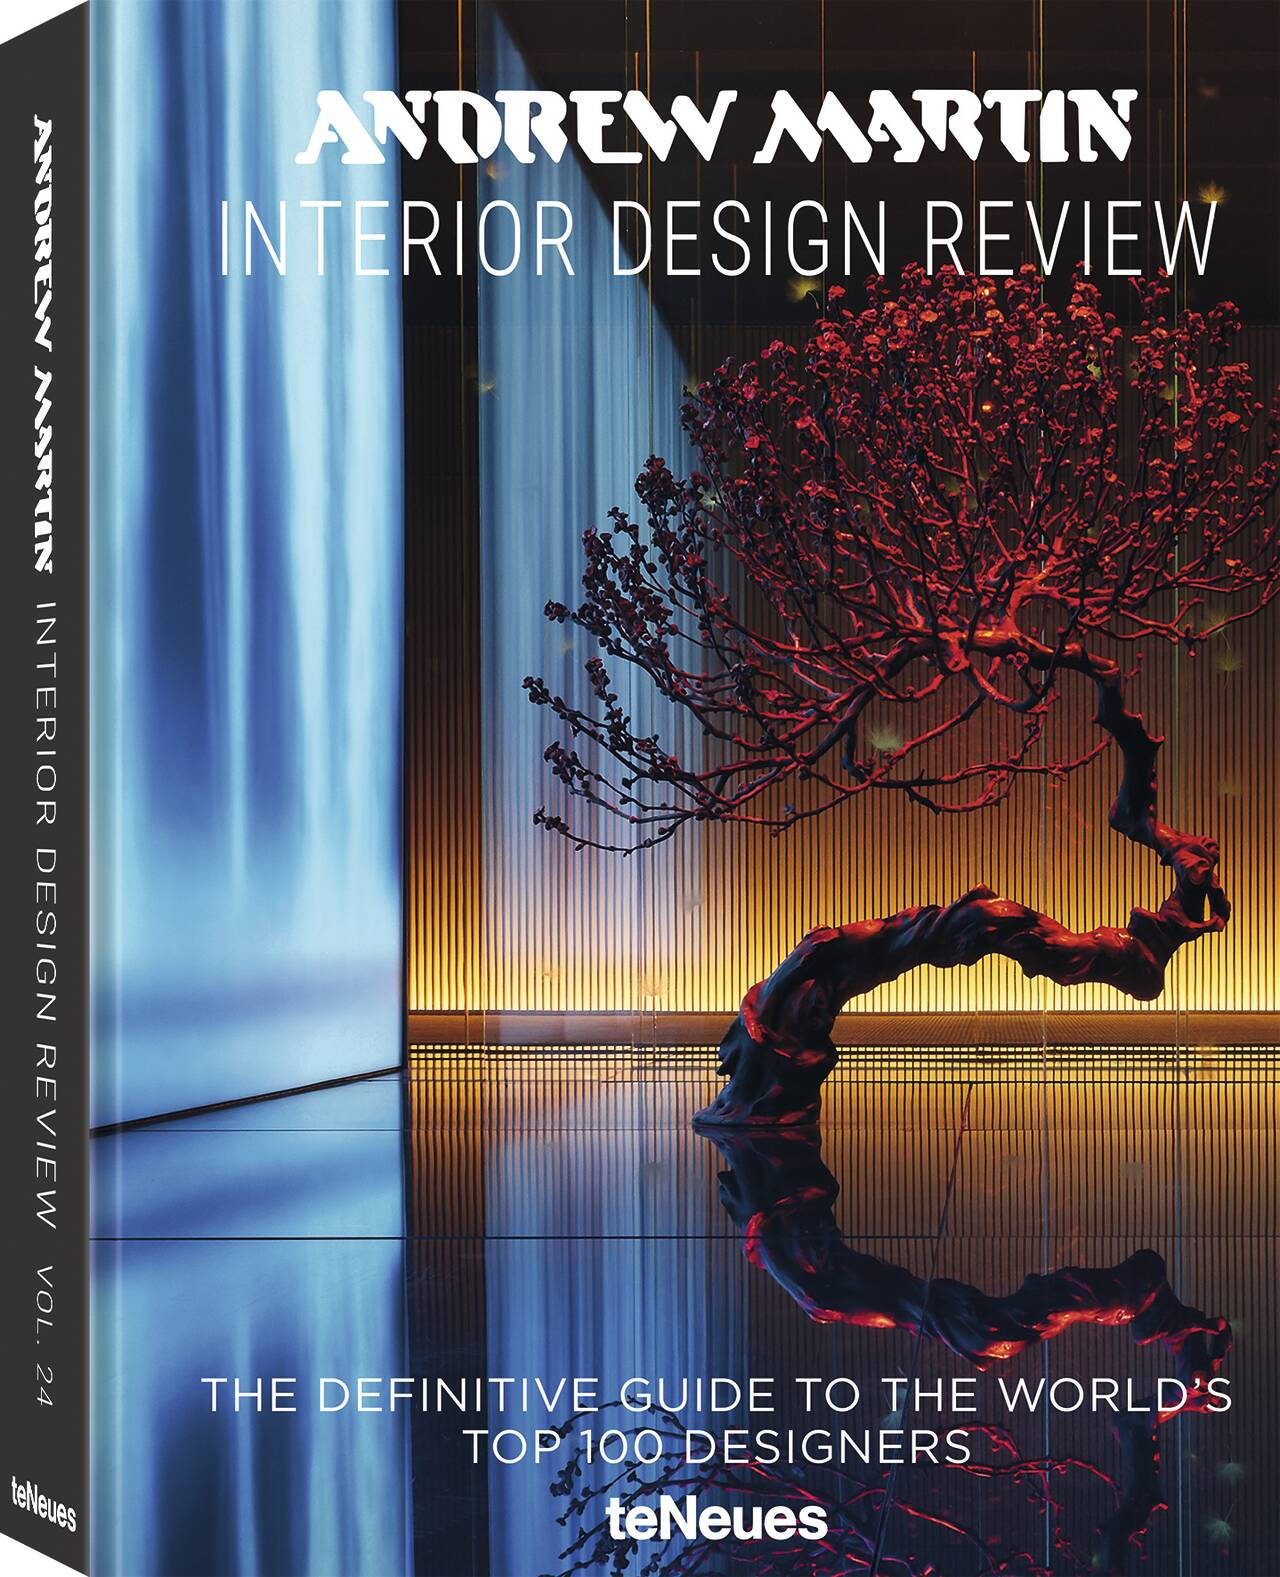 Andrew Martin Interior Design Review Vol. 24